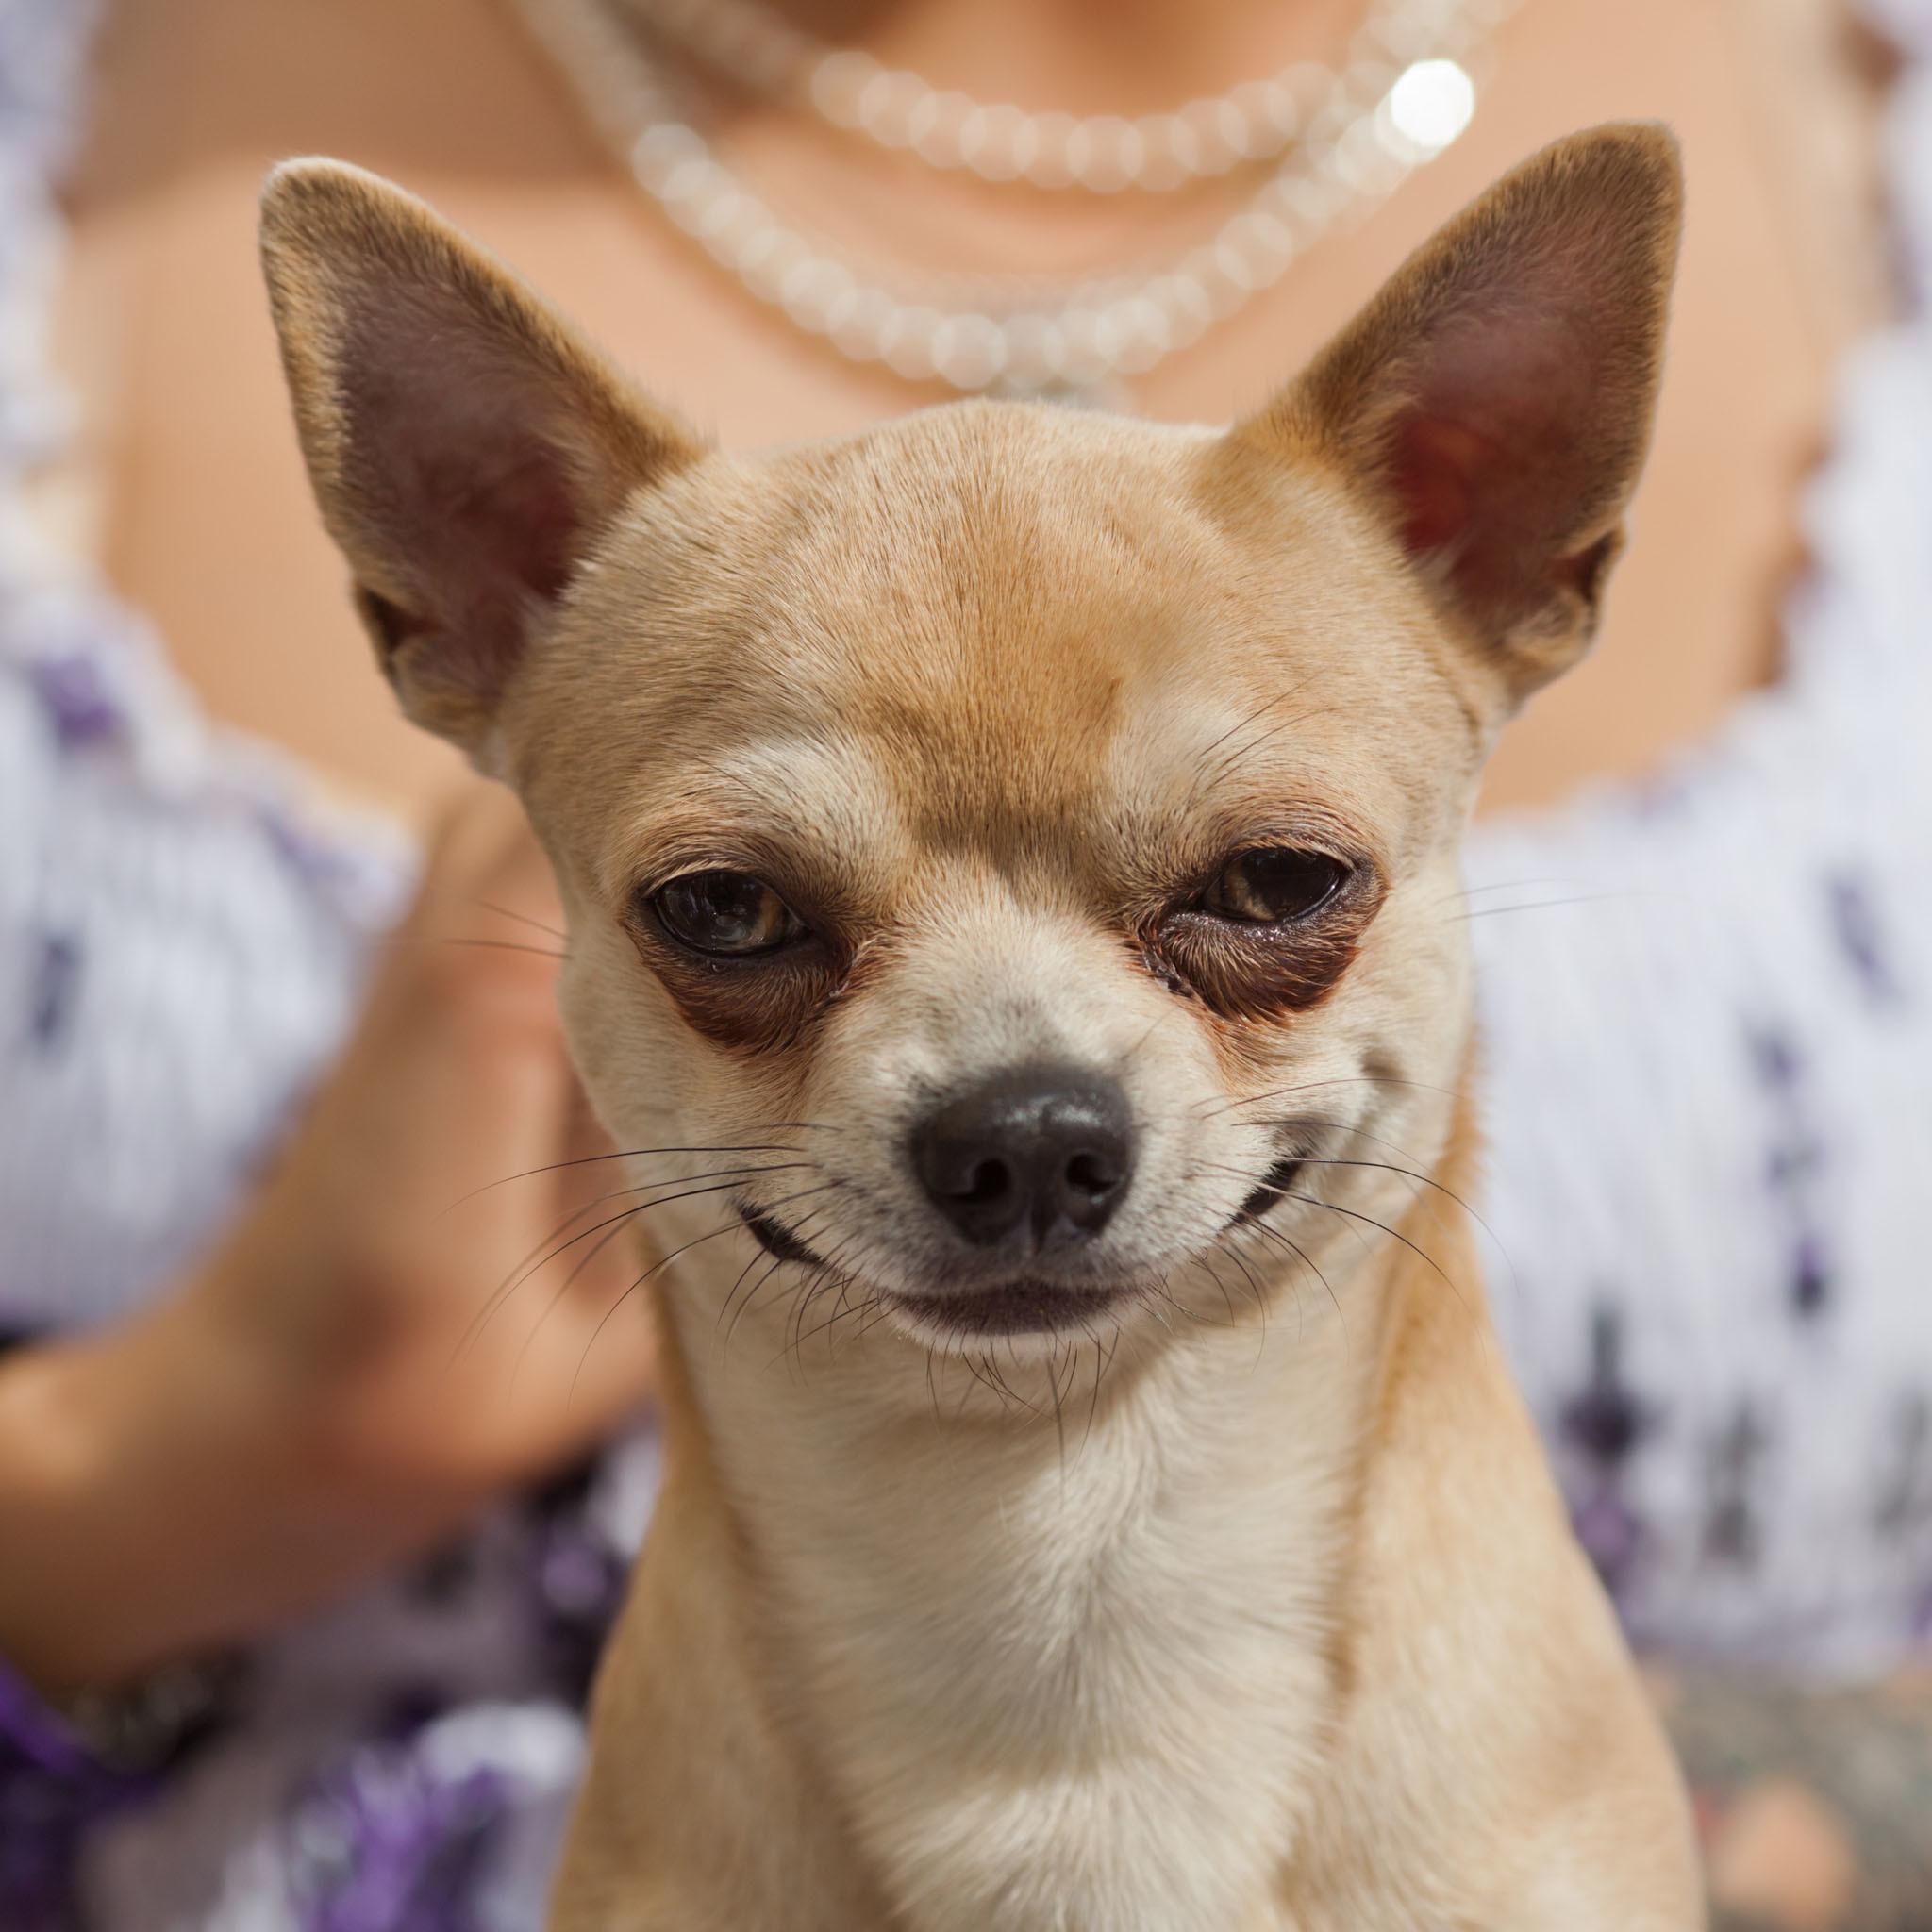 Chihuahua Dog Wallpapers – https://whatstrendingonline.com/chihuahua-dog-